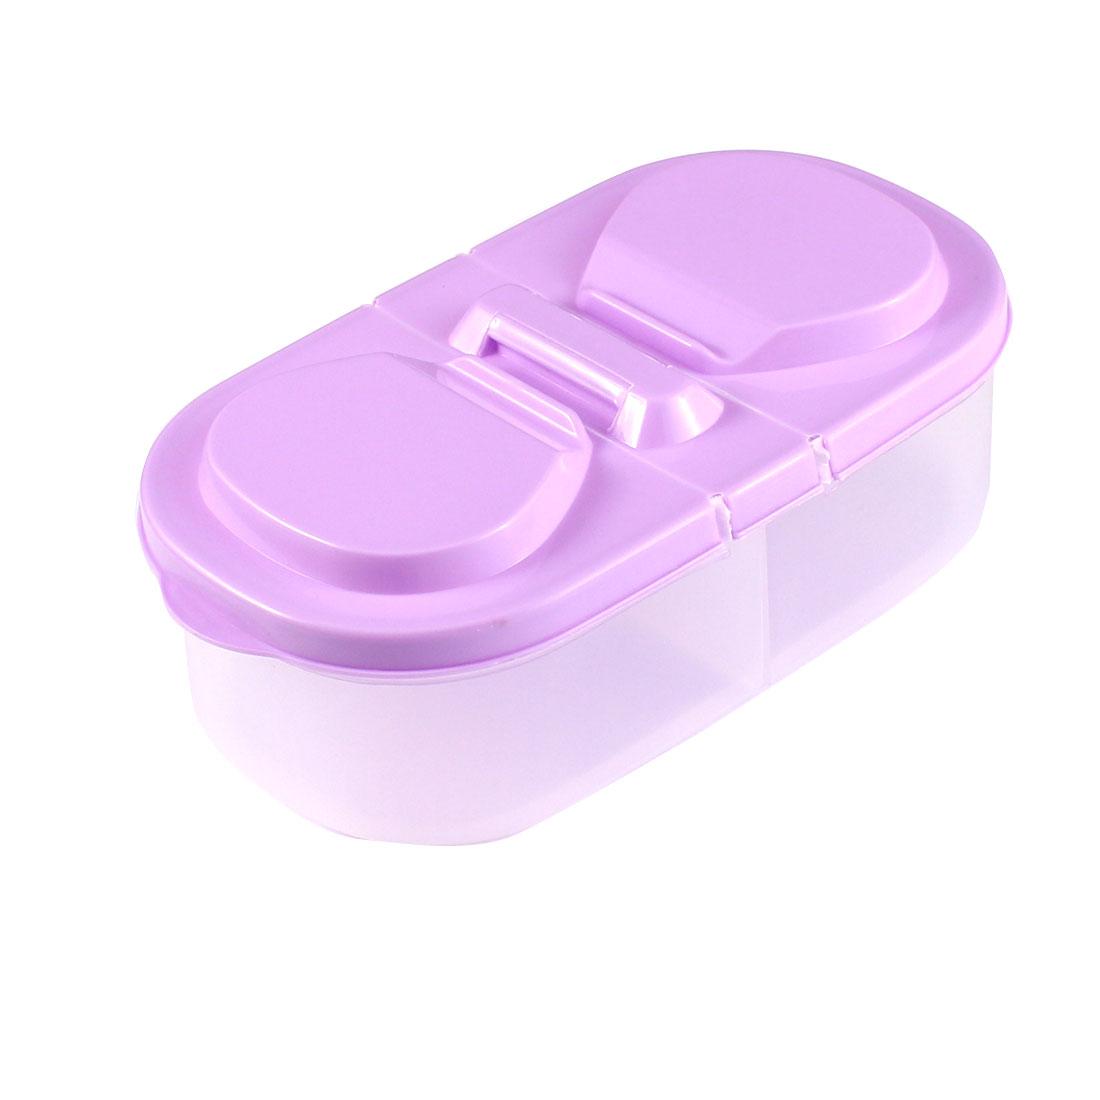 Household Plastic 2 Compartments Food Storage Box Light Purple